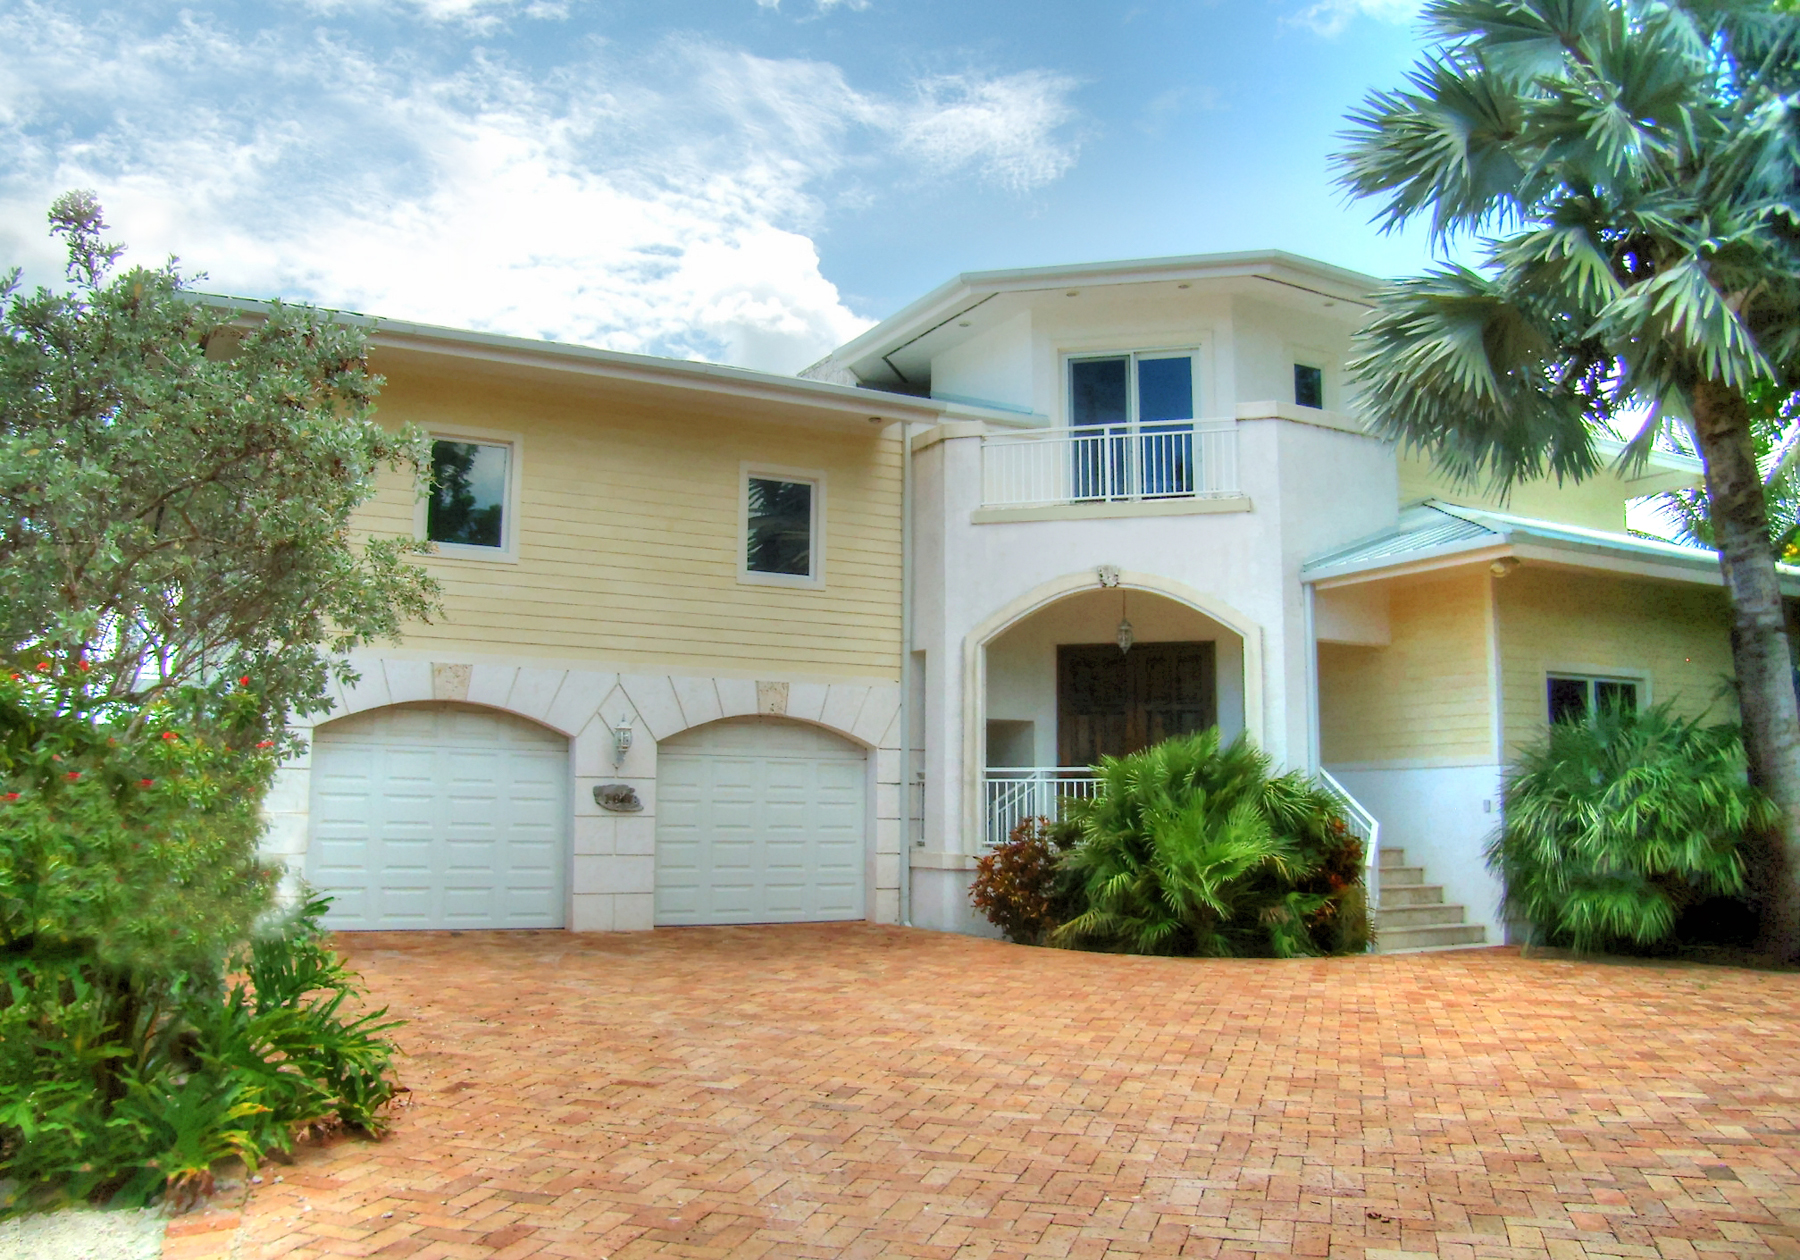 160 Stromboli Dr, Plantation Key, Florida 33036